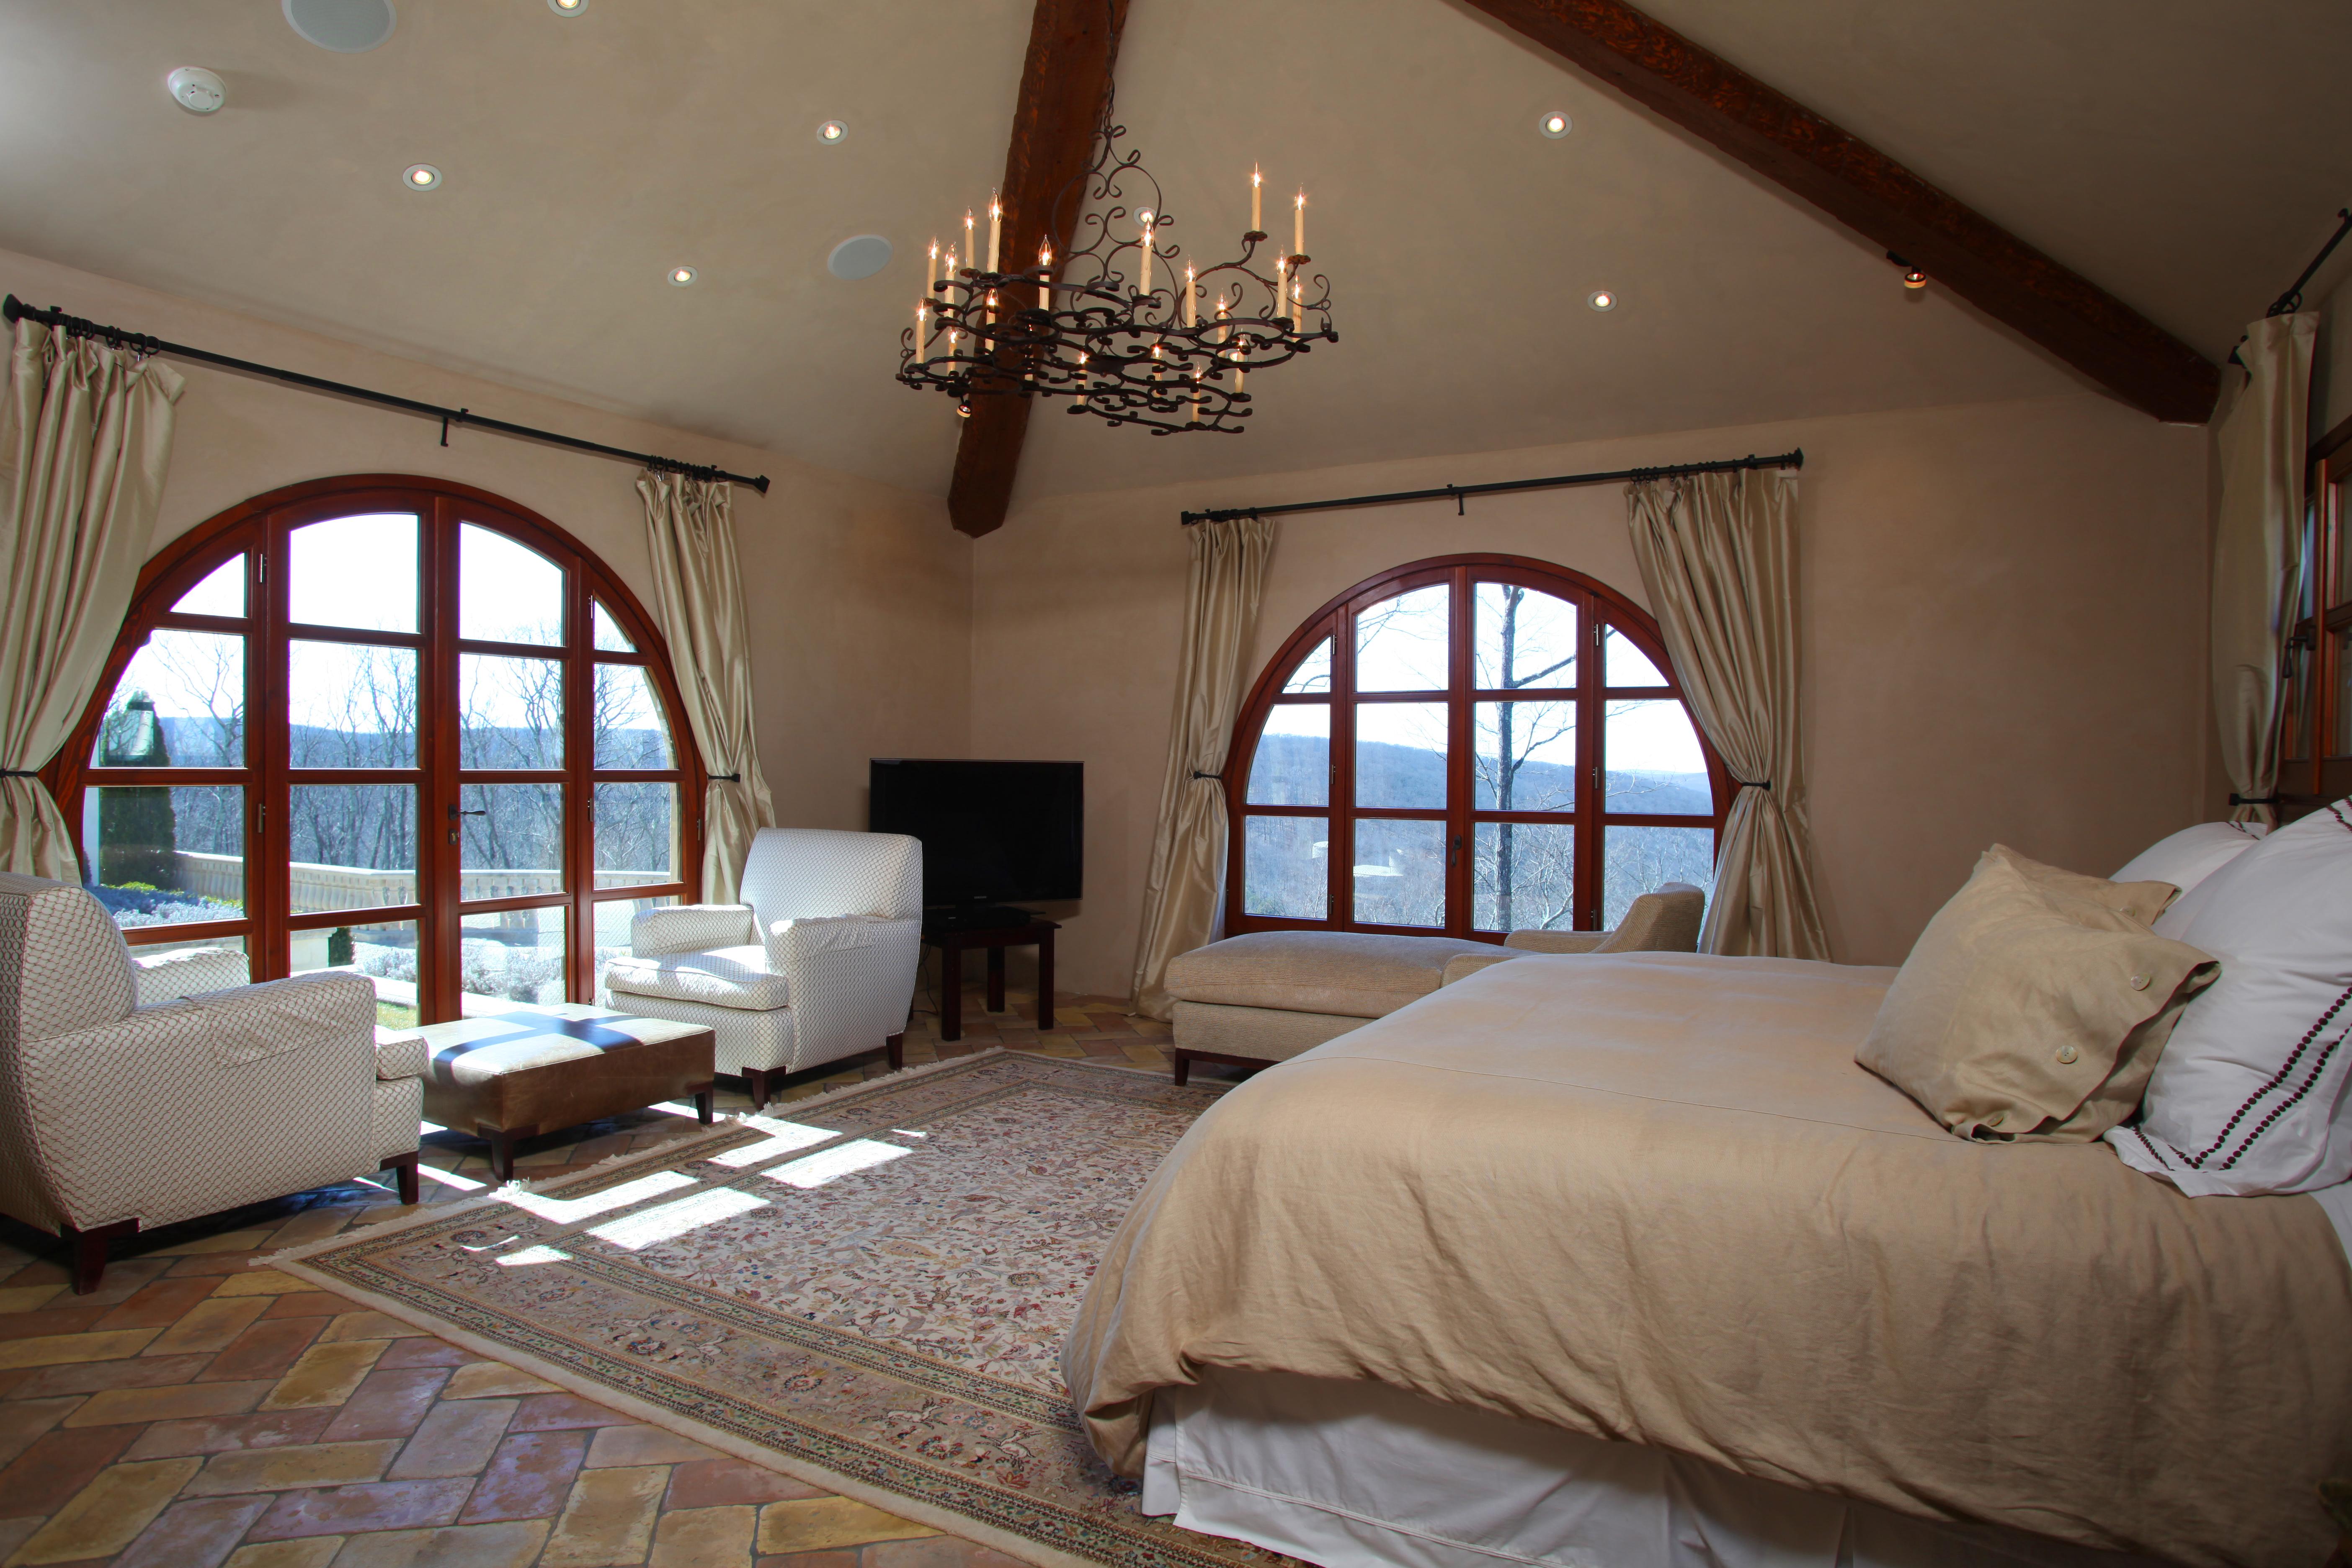 Property Of The Pinnacle - Summer Rental